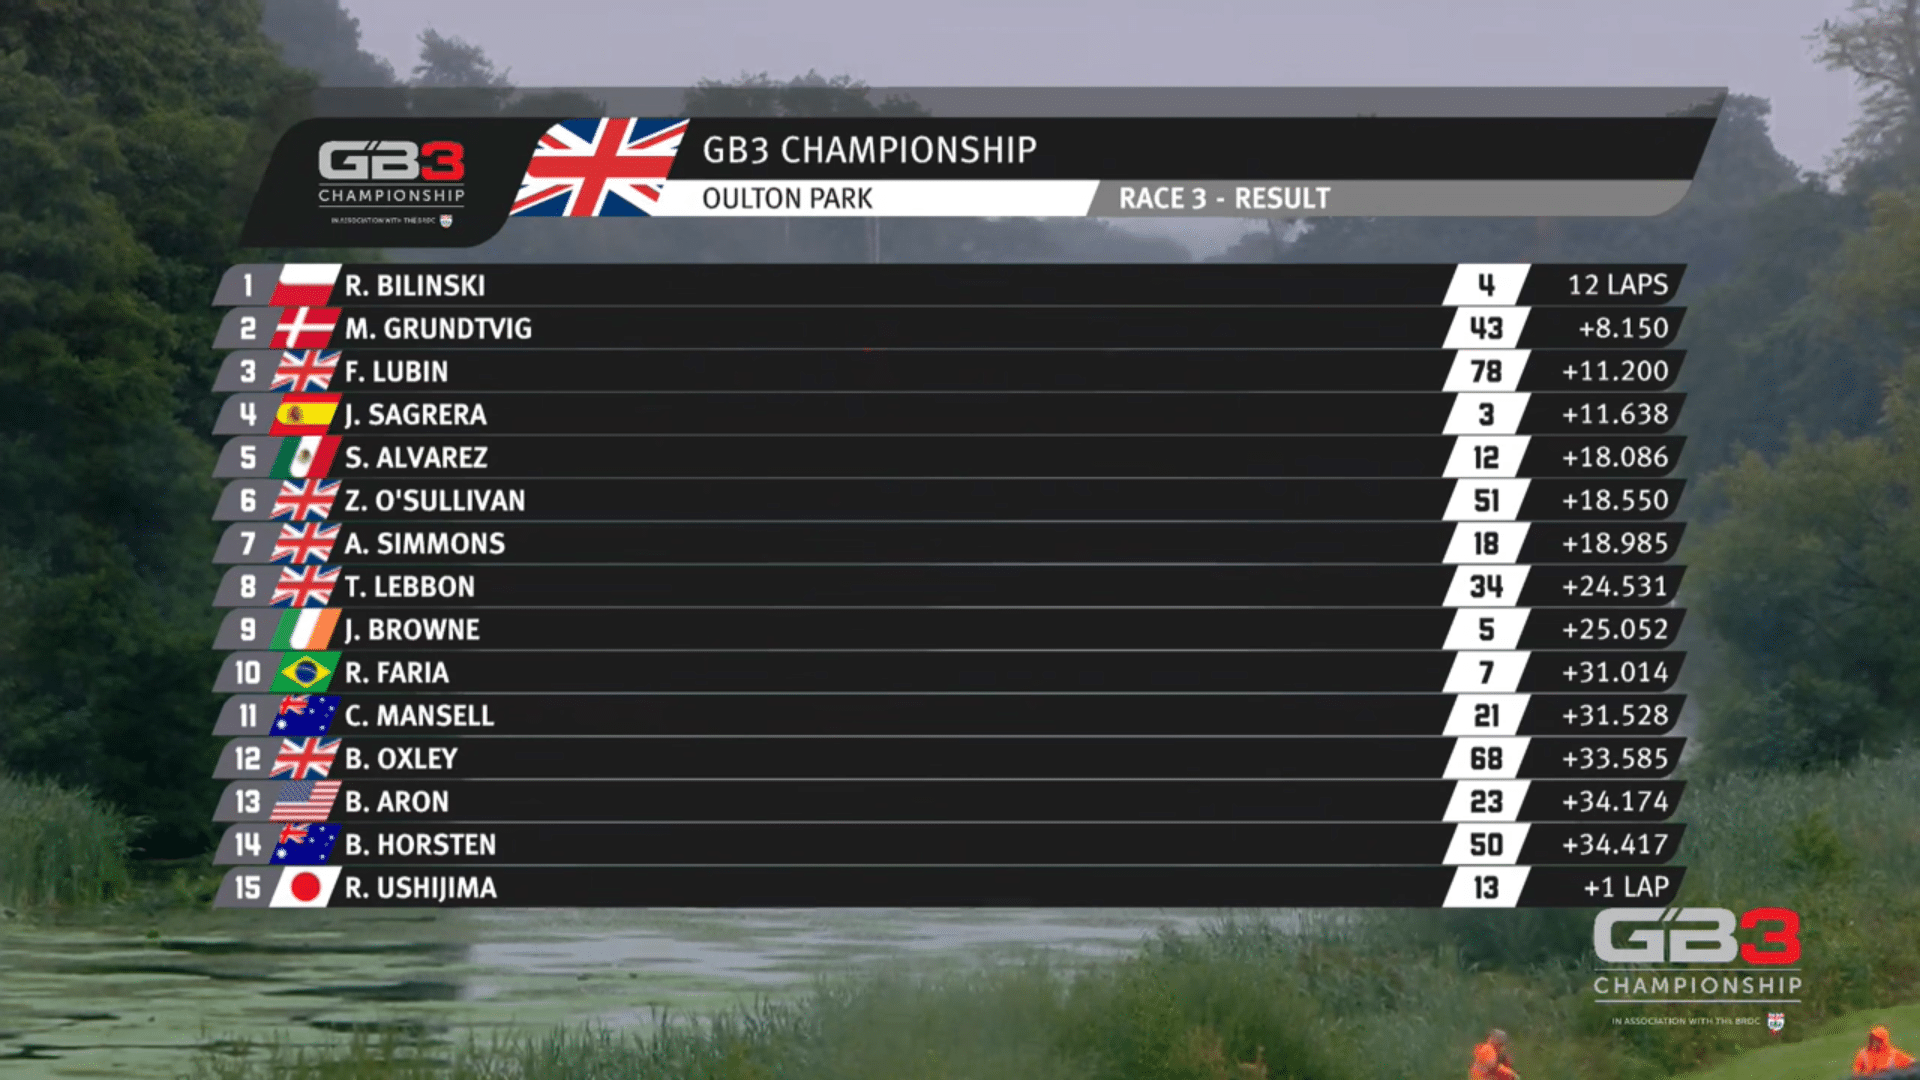 GB3 Championship Oulton Park wyniki